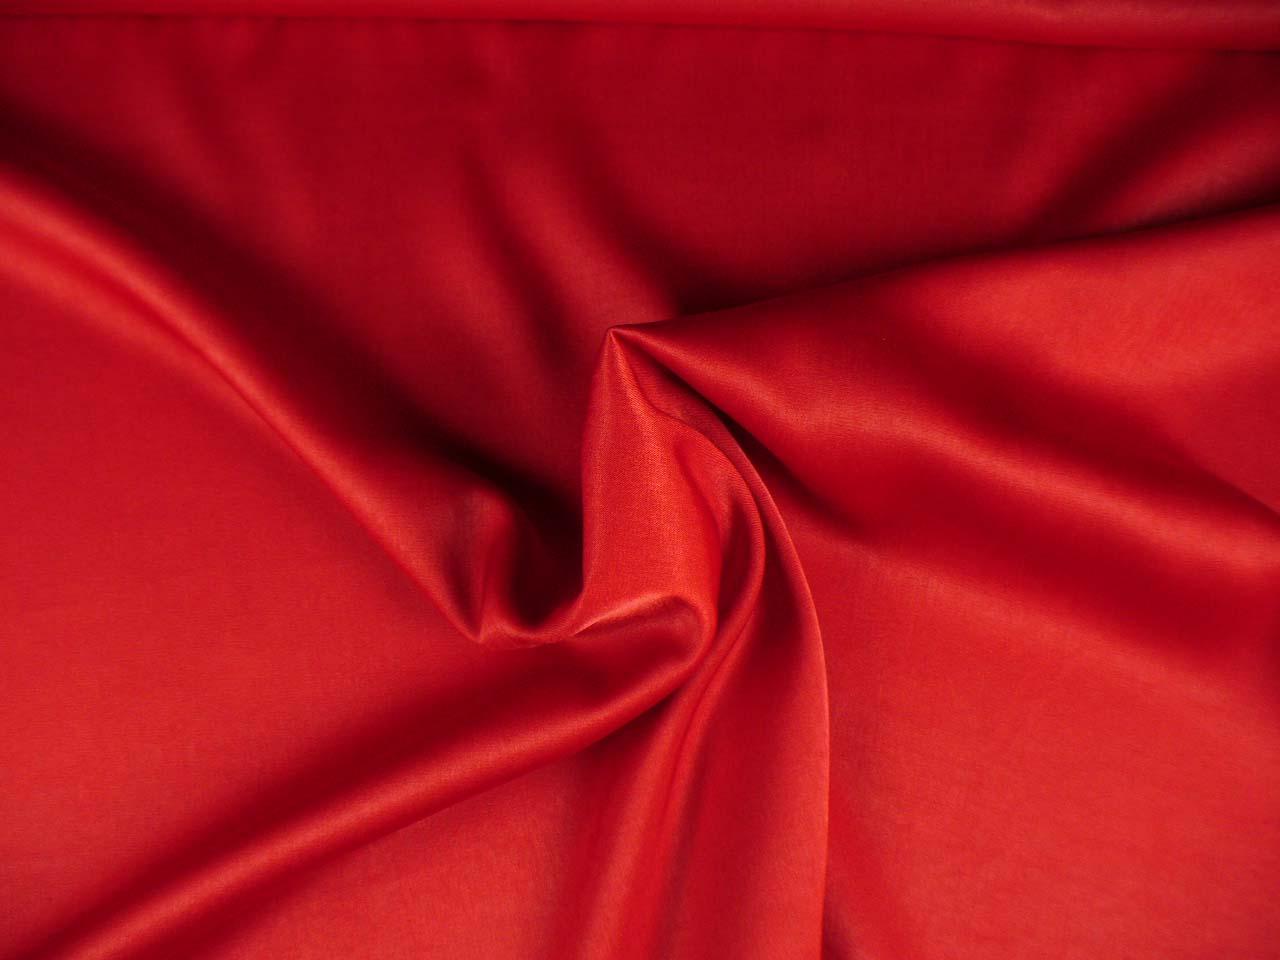 červený satén CUPRO